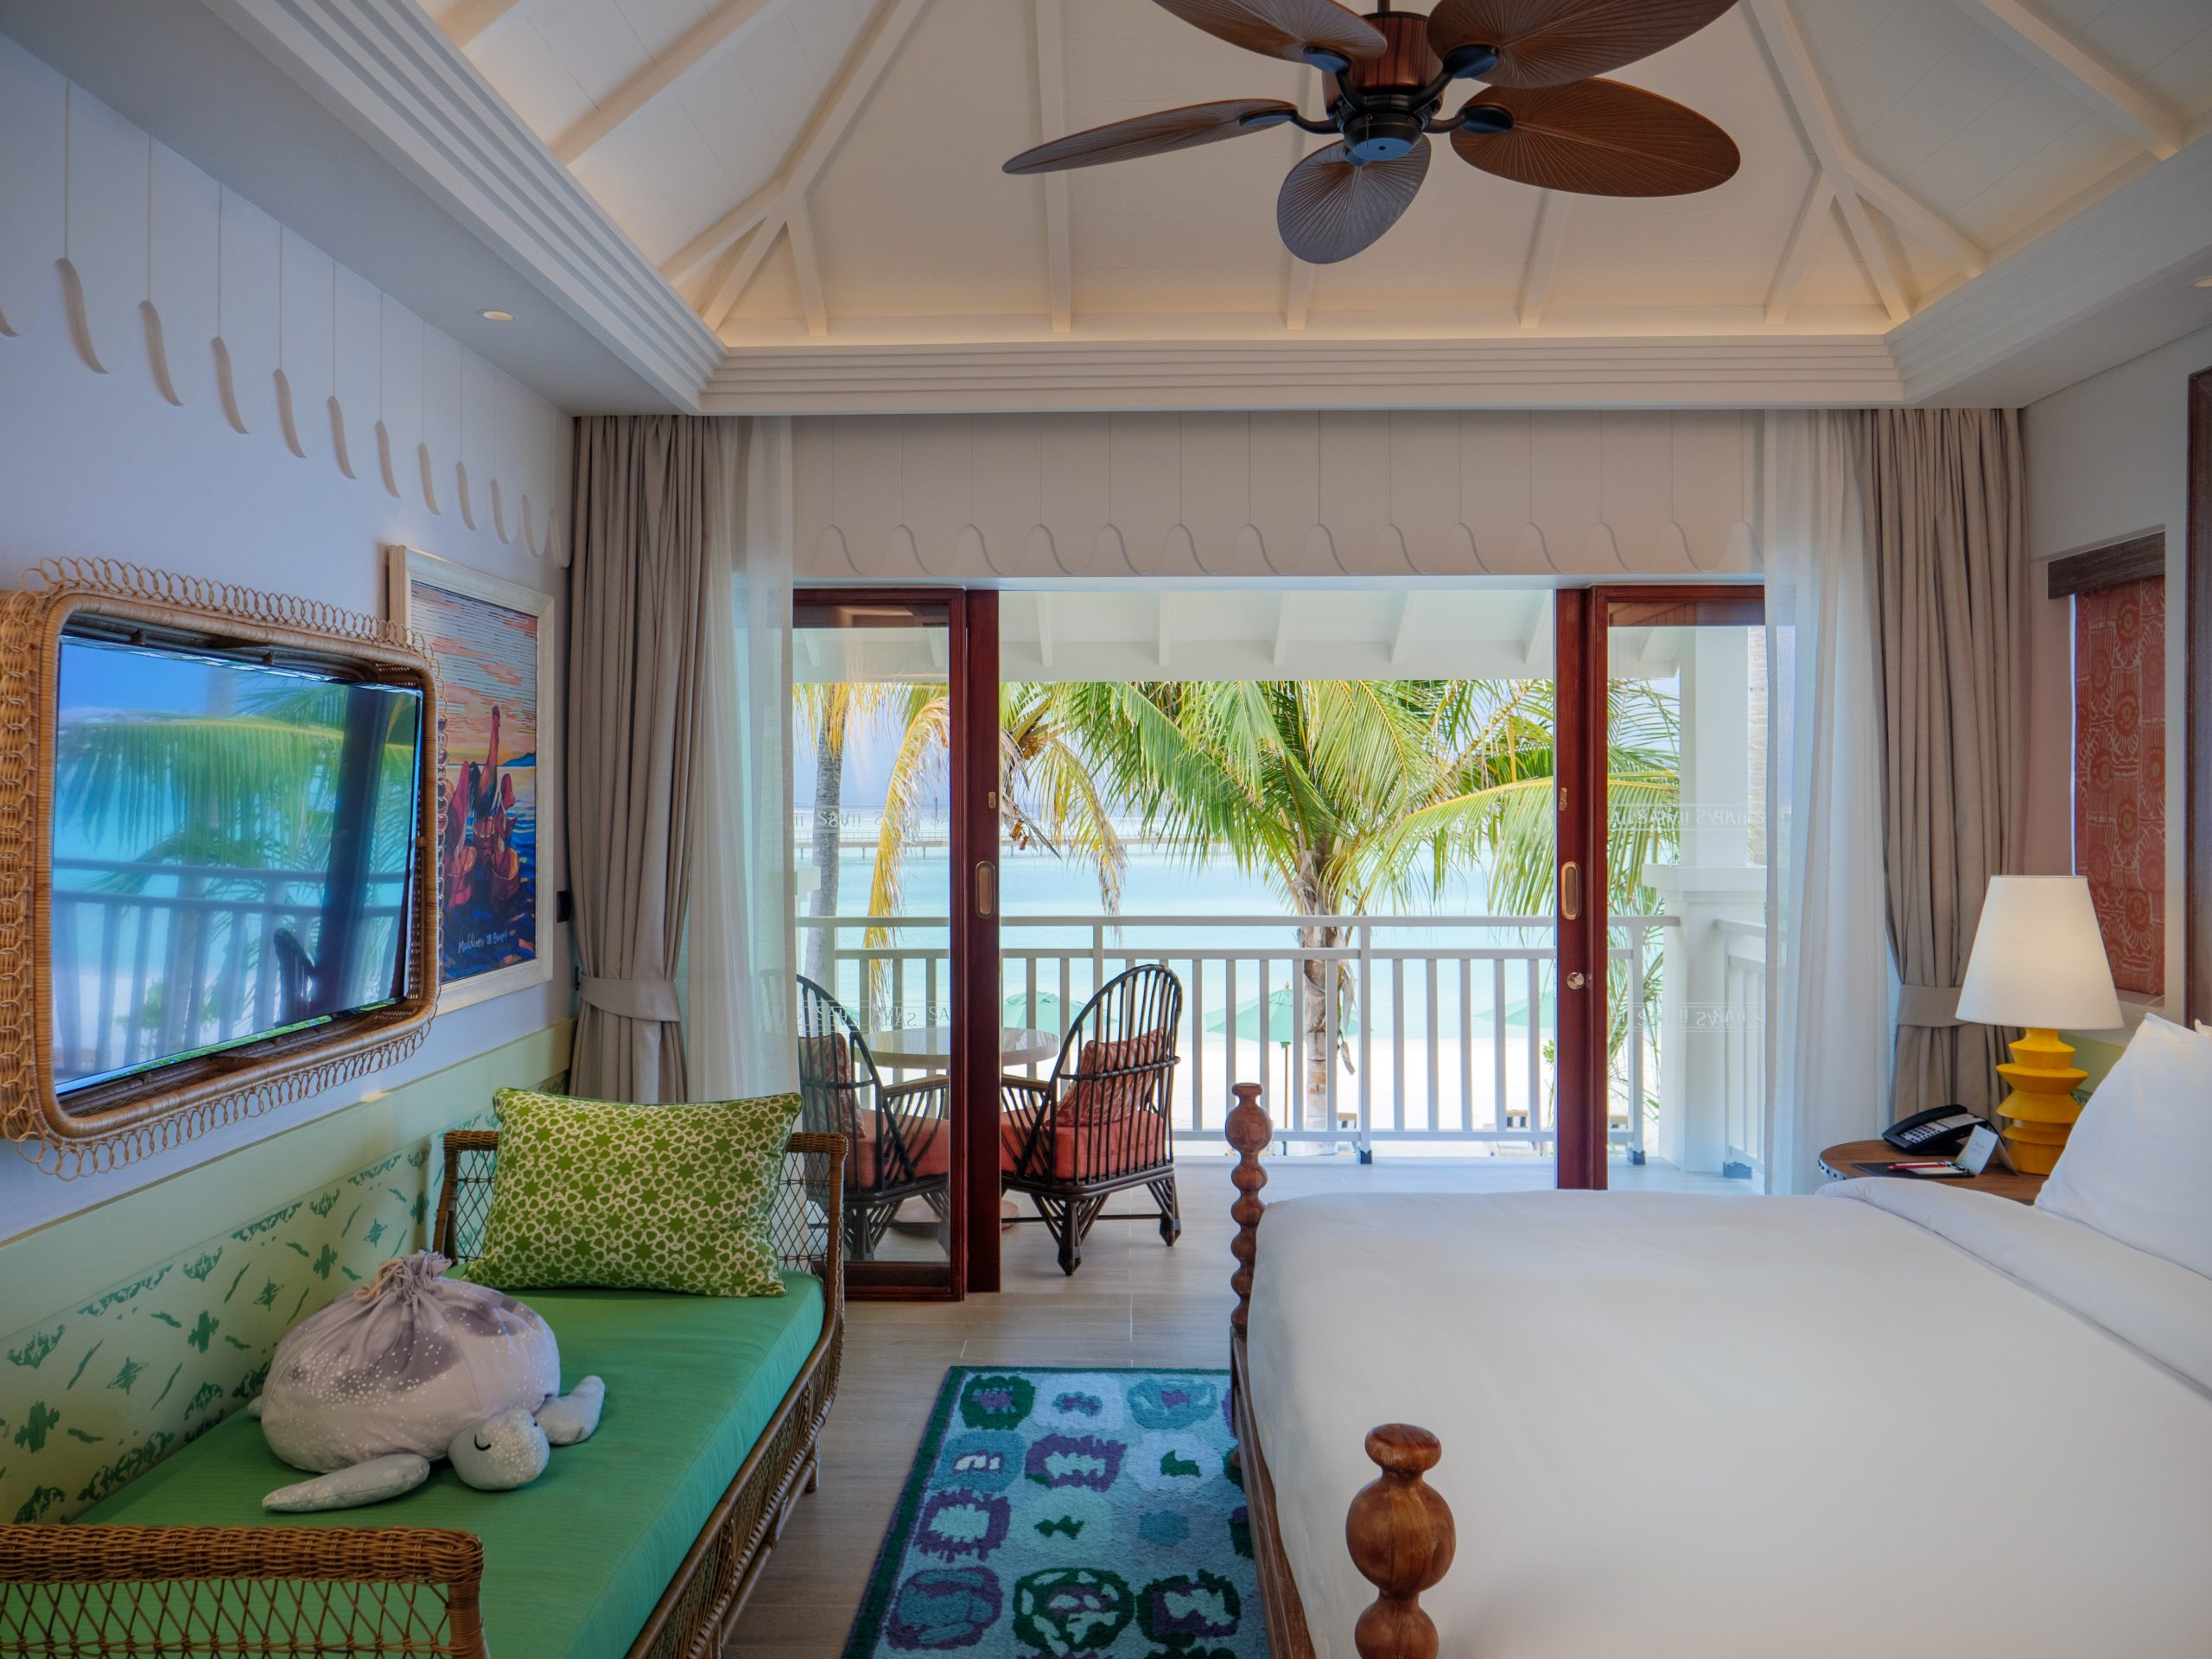 SAii Lagoon Maldives_Sky Room-K1RV, T2RV - MLEGSQQ